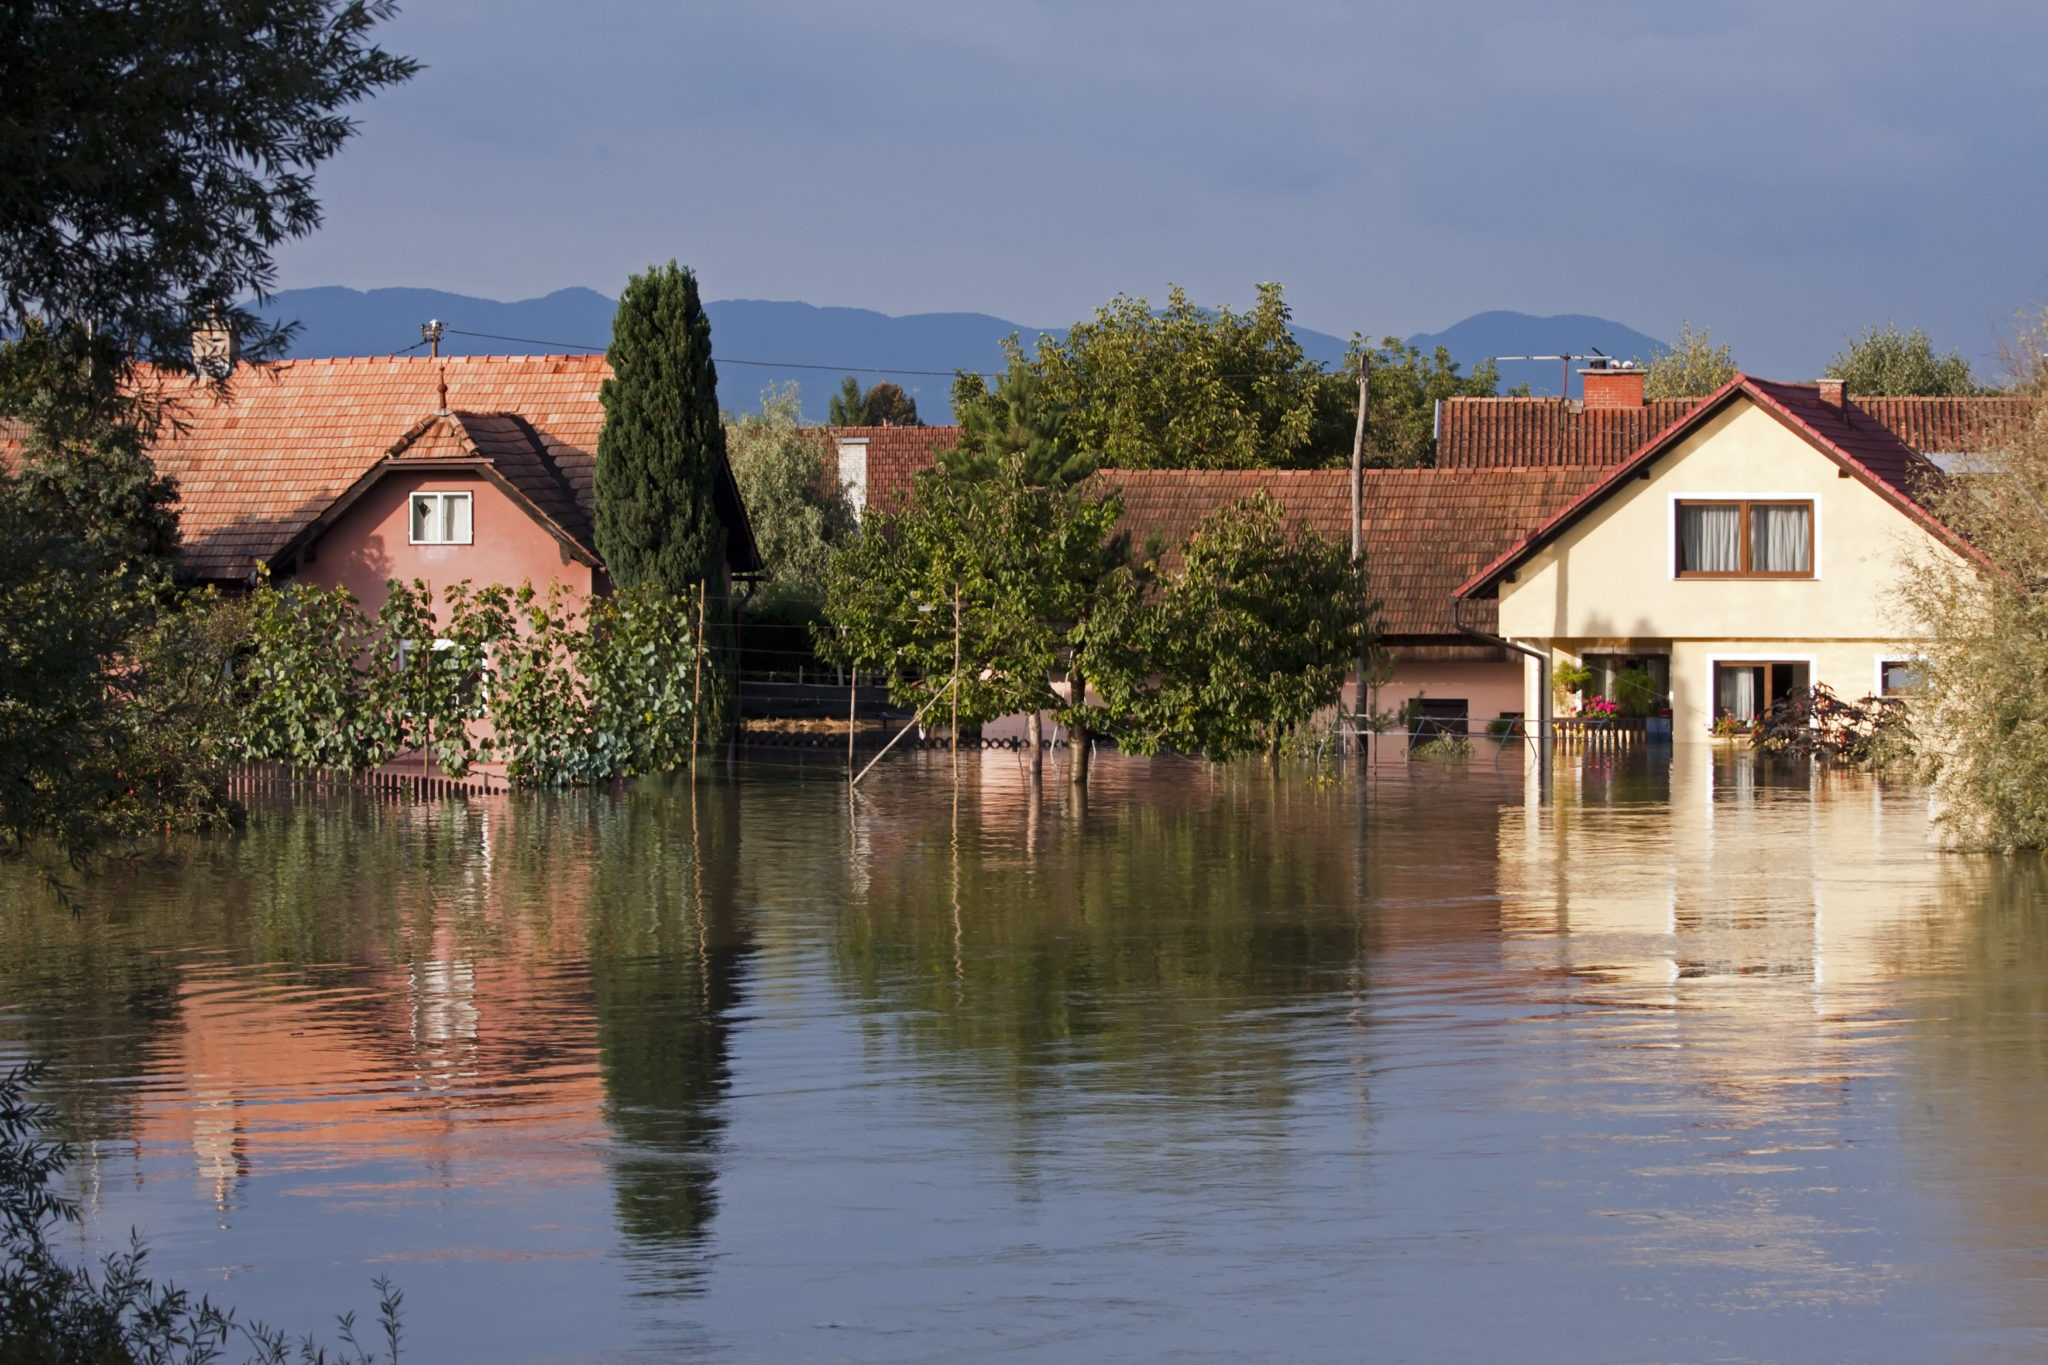 Immobilier logement inondable inondation